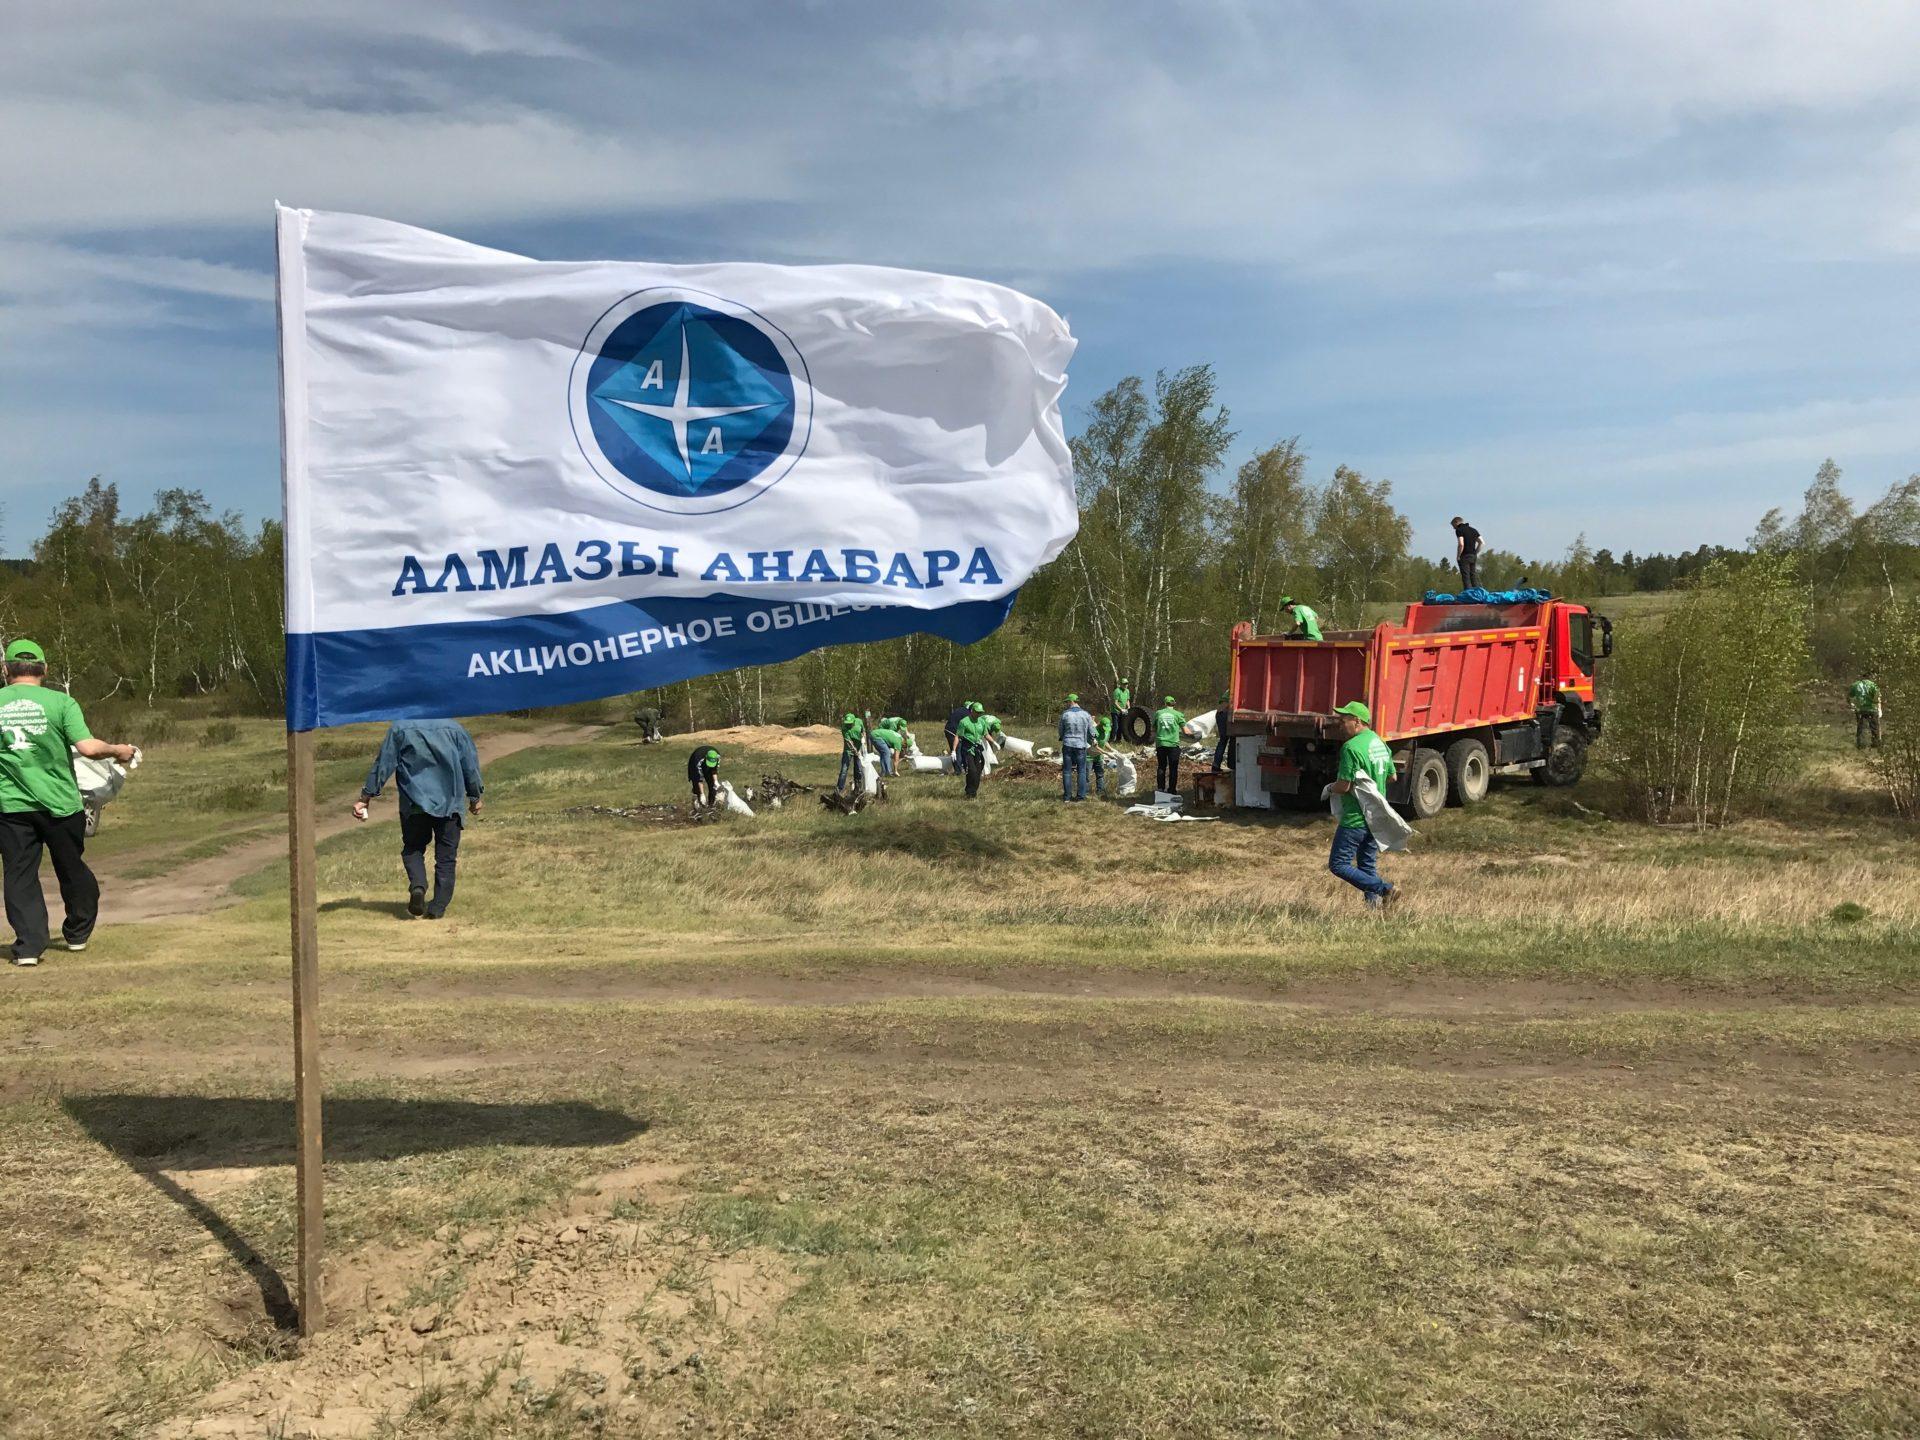 Алмазы Анабара» очистили зелёную зону в пригороде Якутска